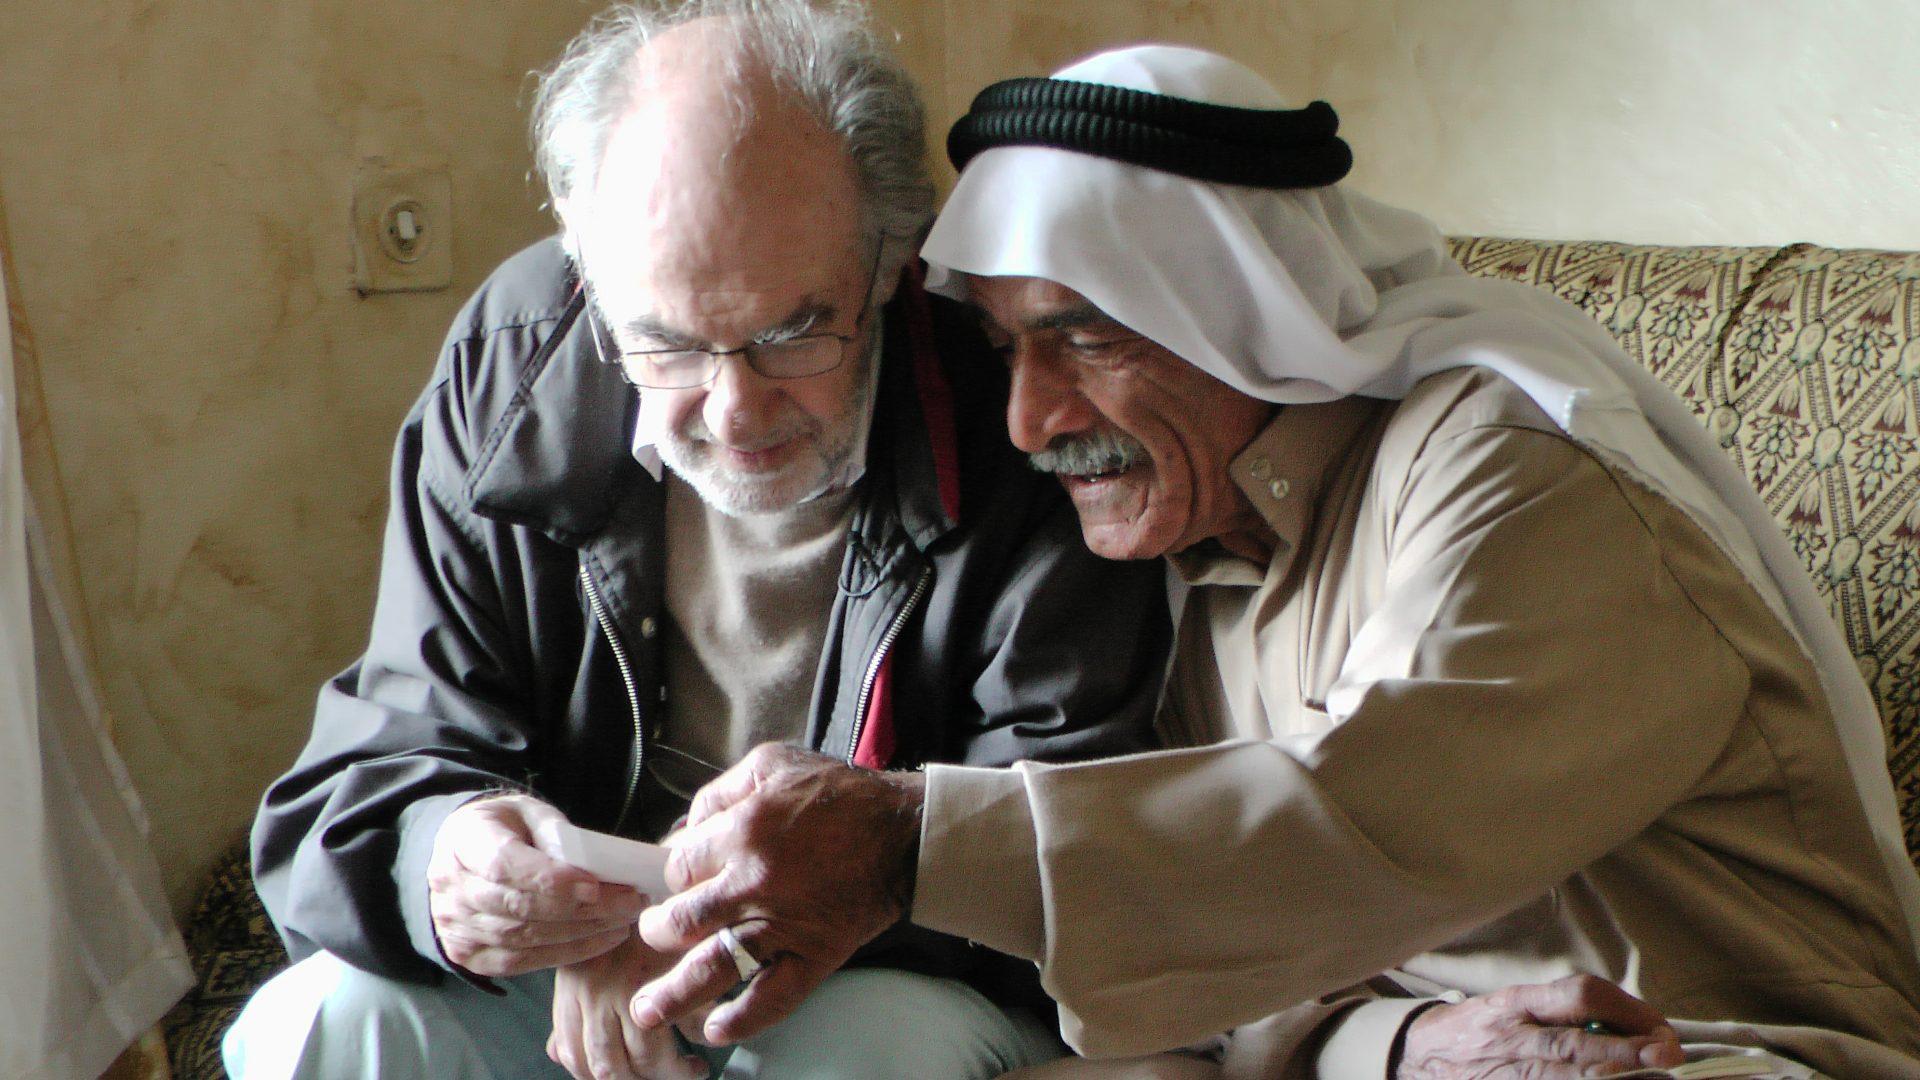 Abu Dhabi Film Festival 2010: Homeland and We Were Communists